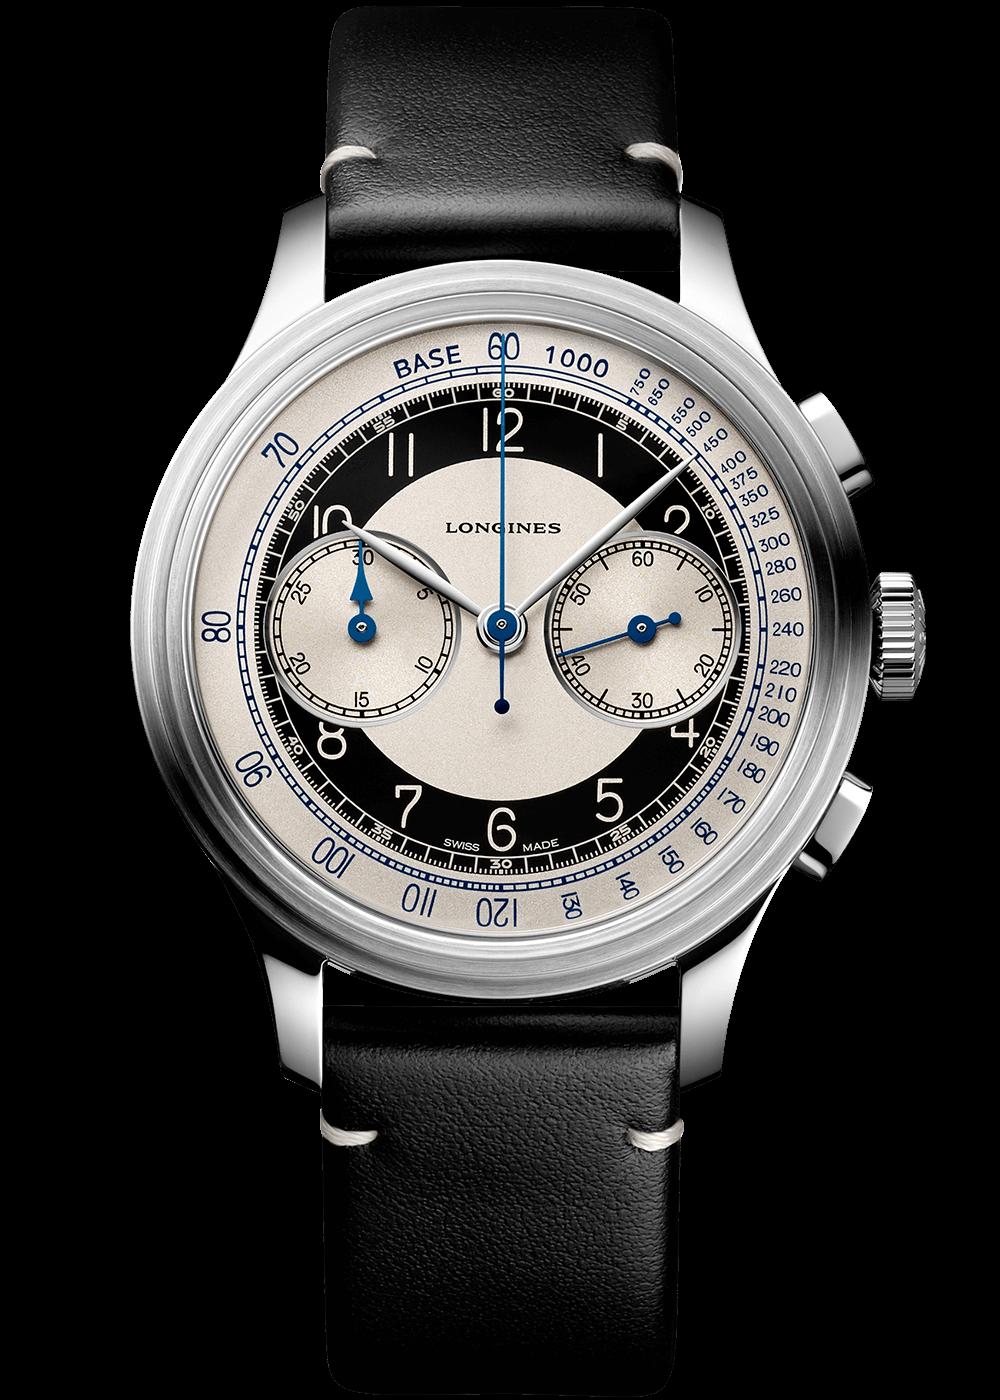 longines-heritage-classic-tuxedo-chronograph